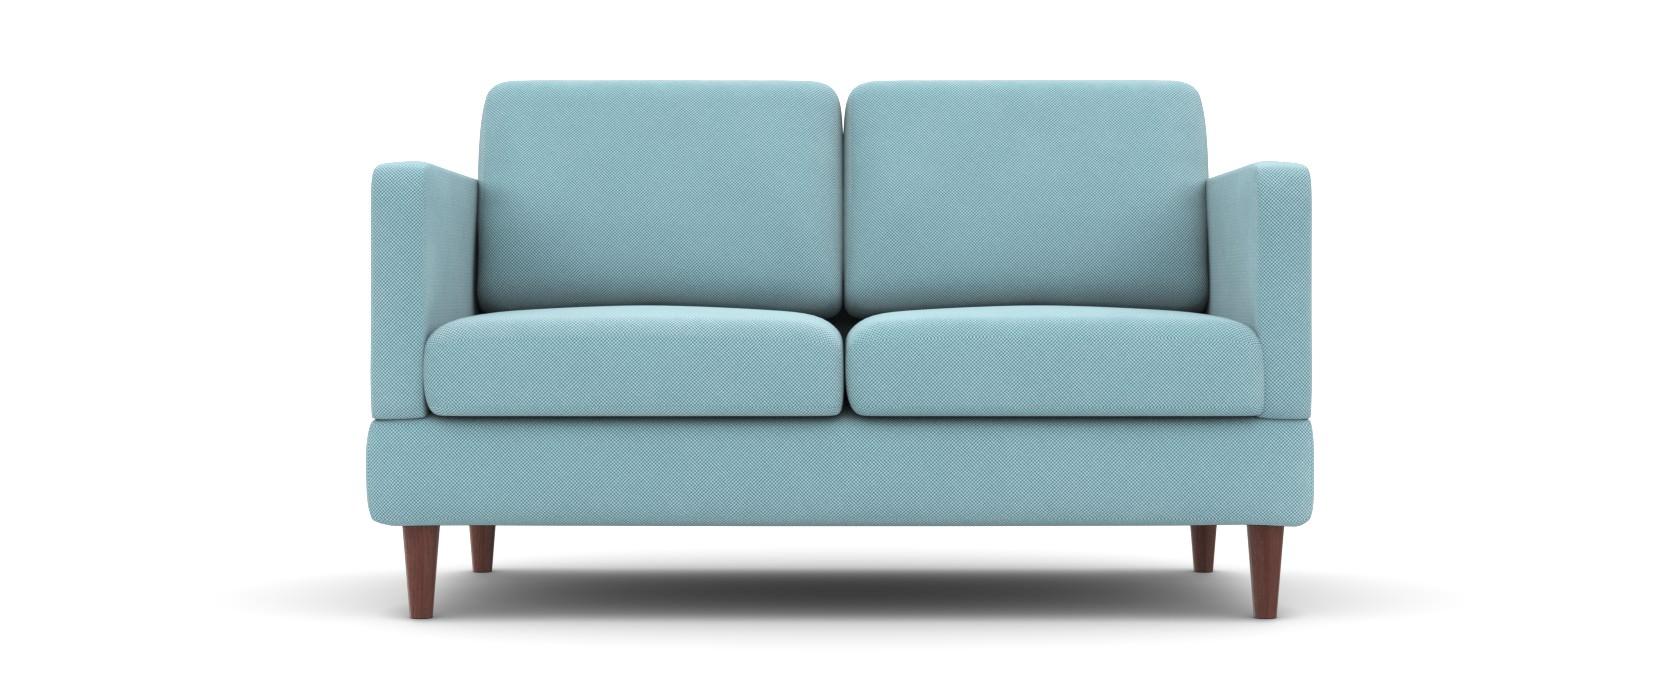 Двомісній диван Bruno Club - Фото 1 - Pufetto